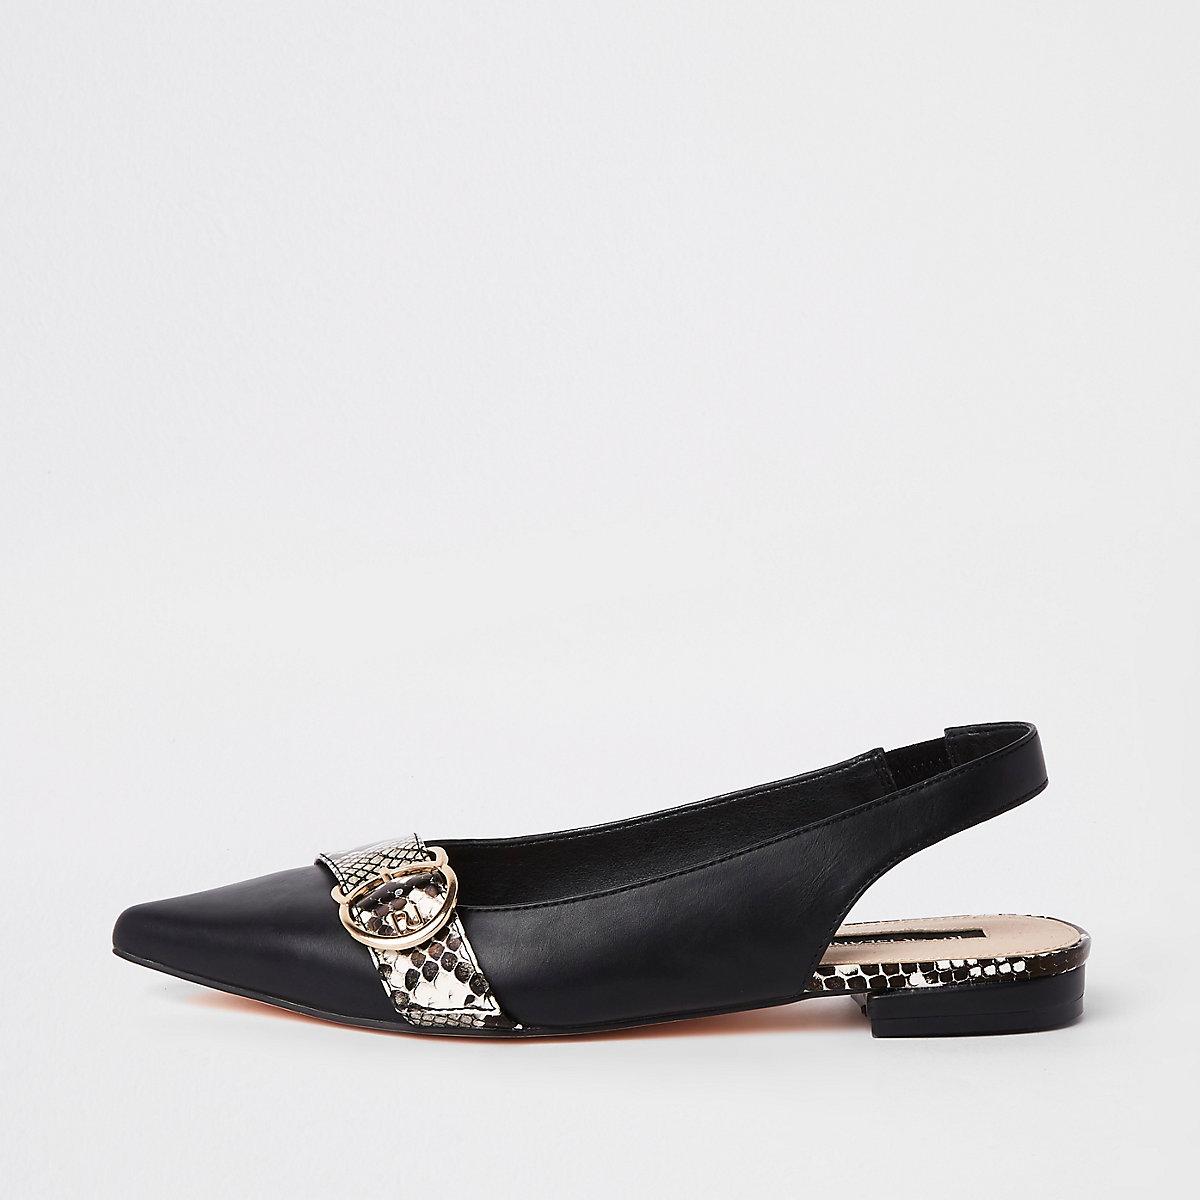 Black pointed toe sling back loafers